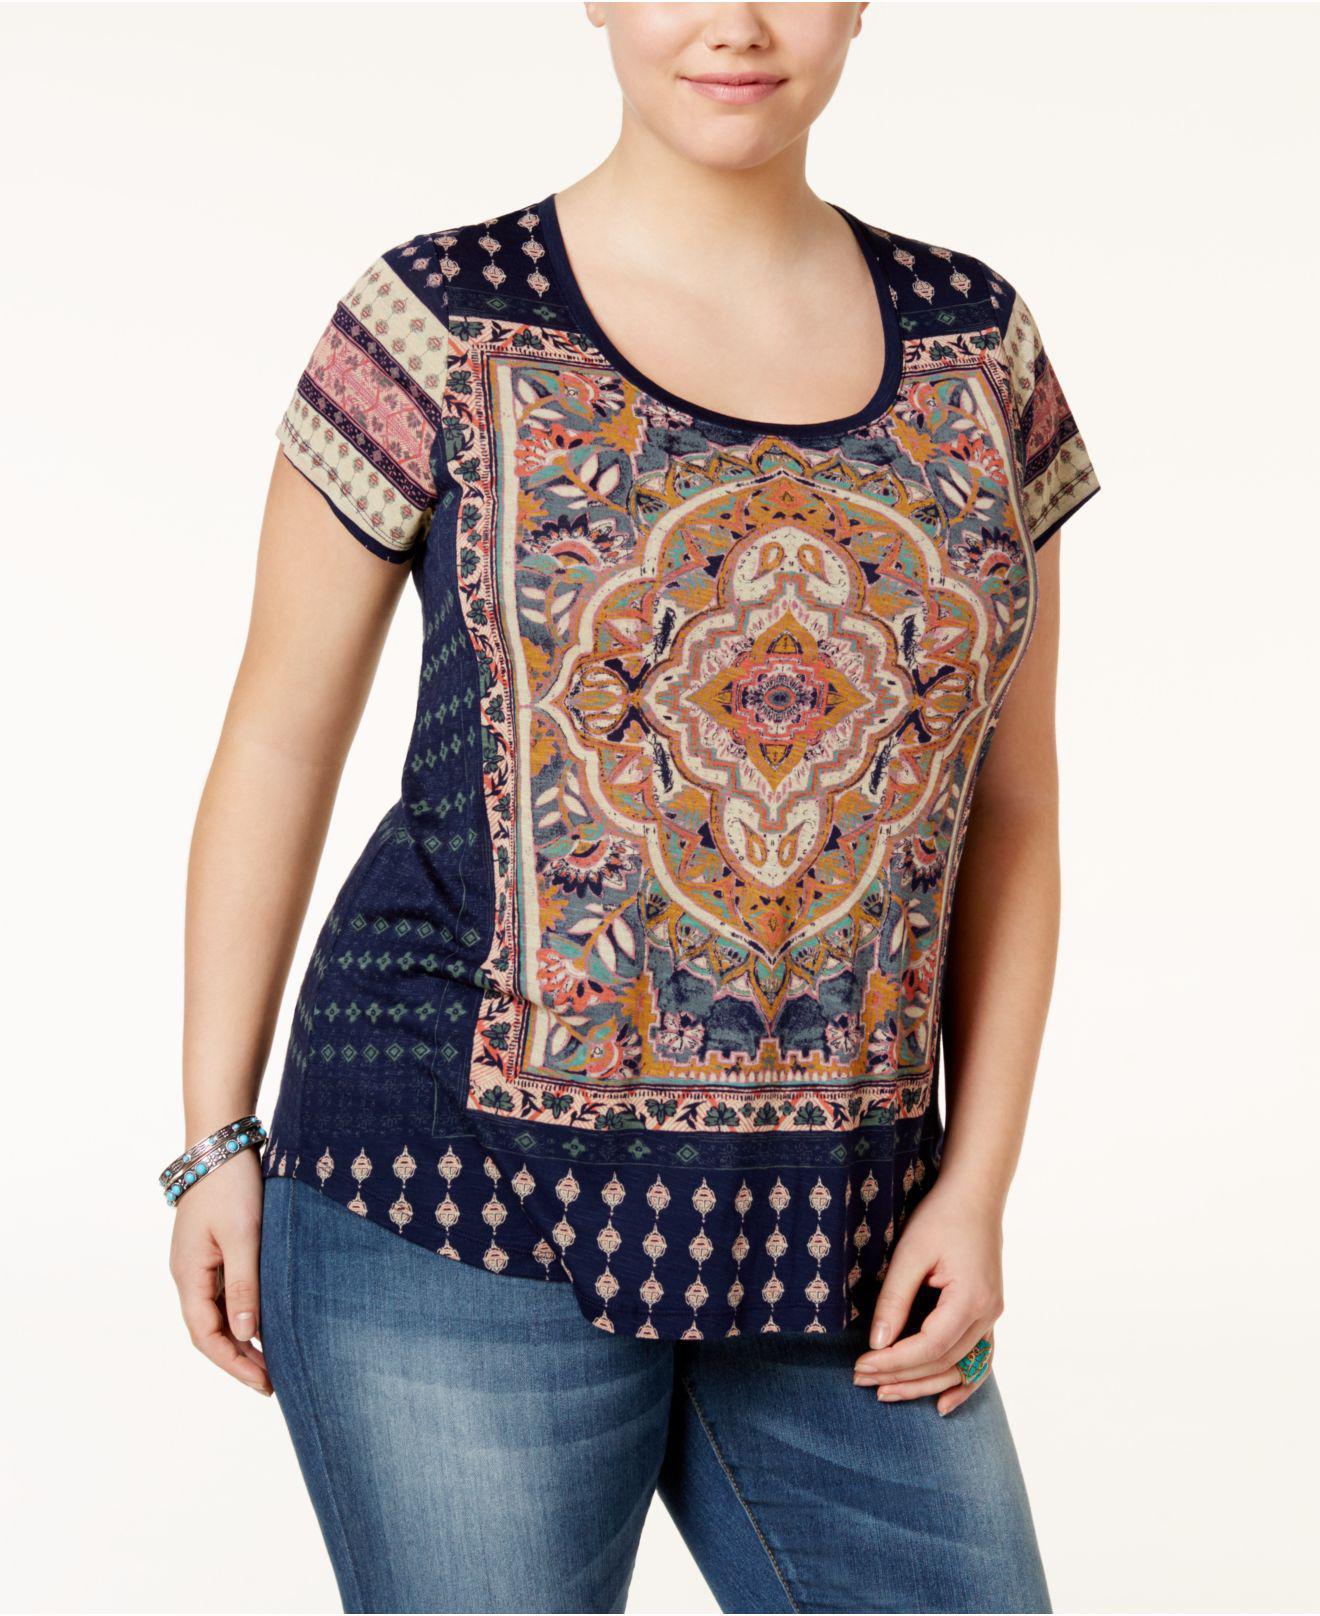 ea6c7dbf866a1 Lucky Brand. Women s Blue Trendy Plus Size Persian Carpet Graphic T-shirt